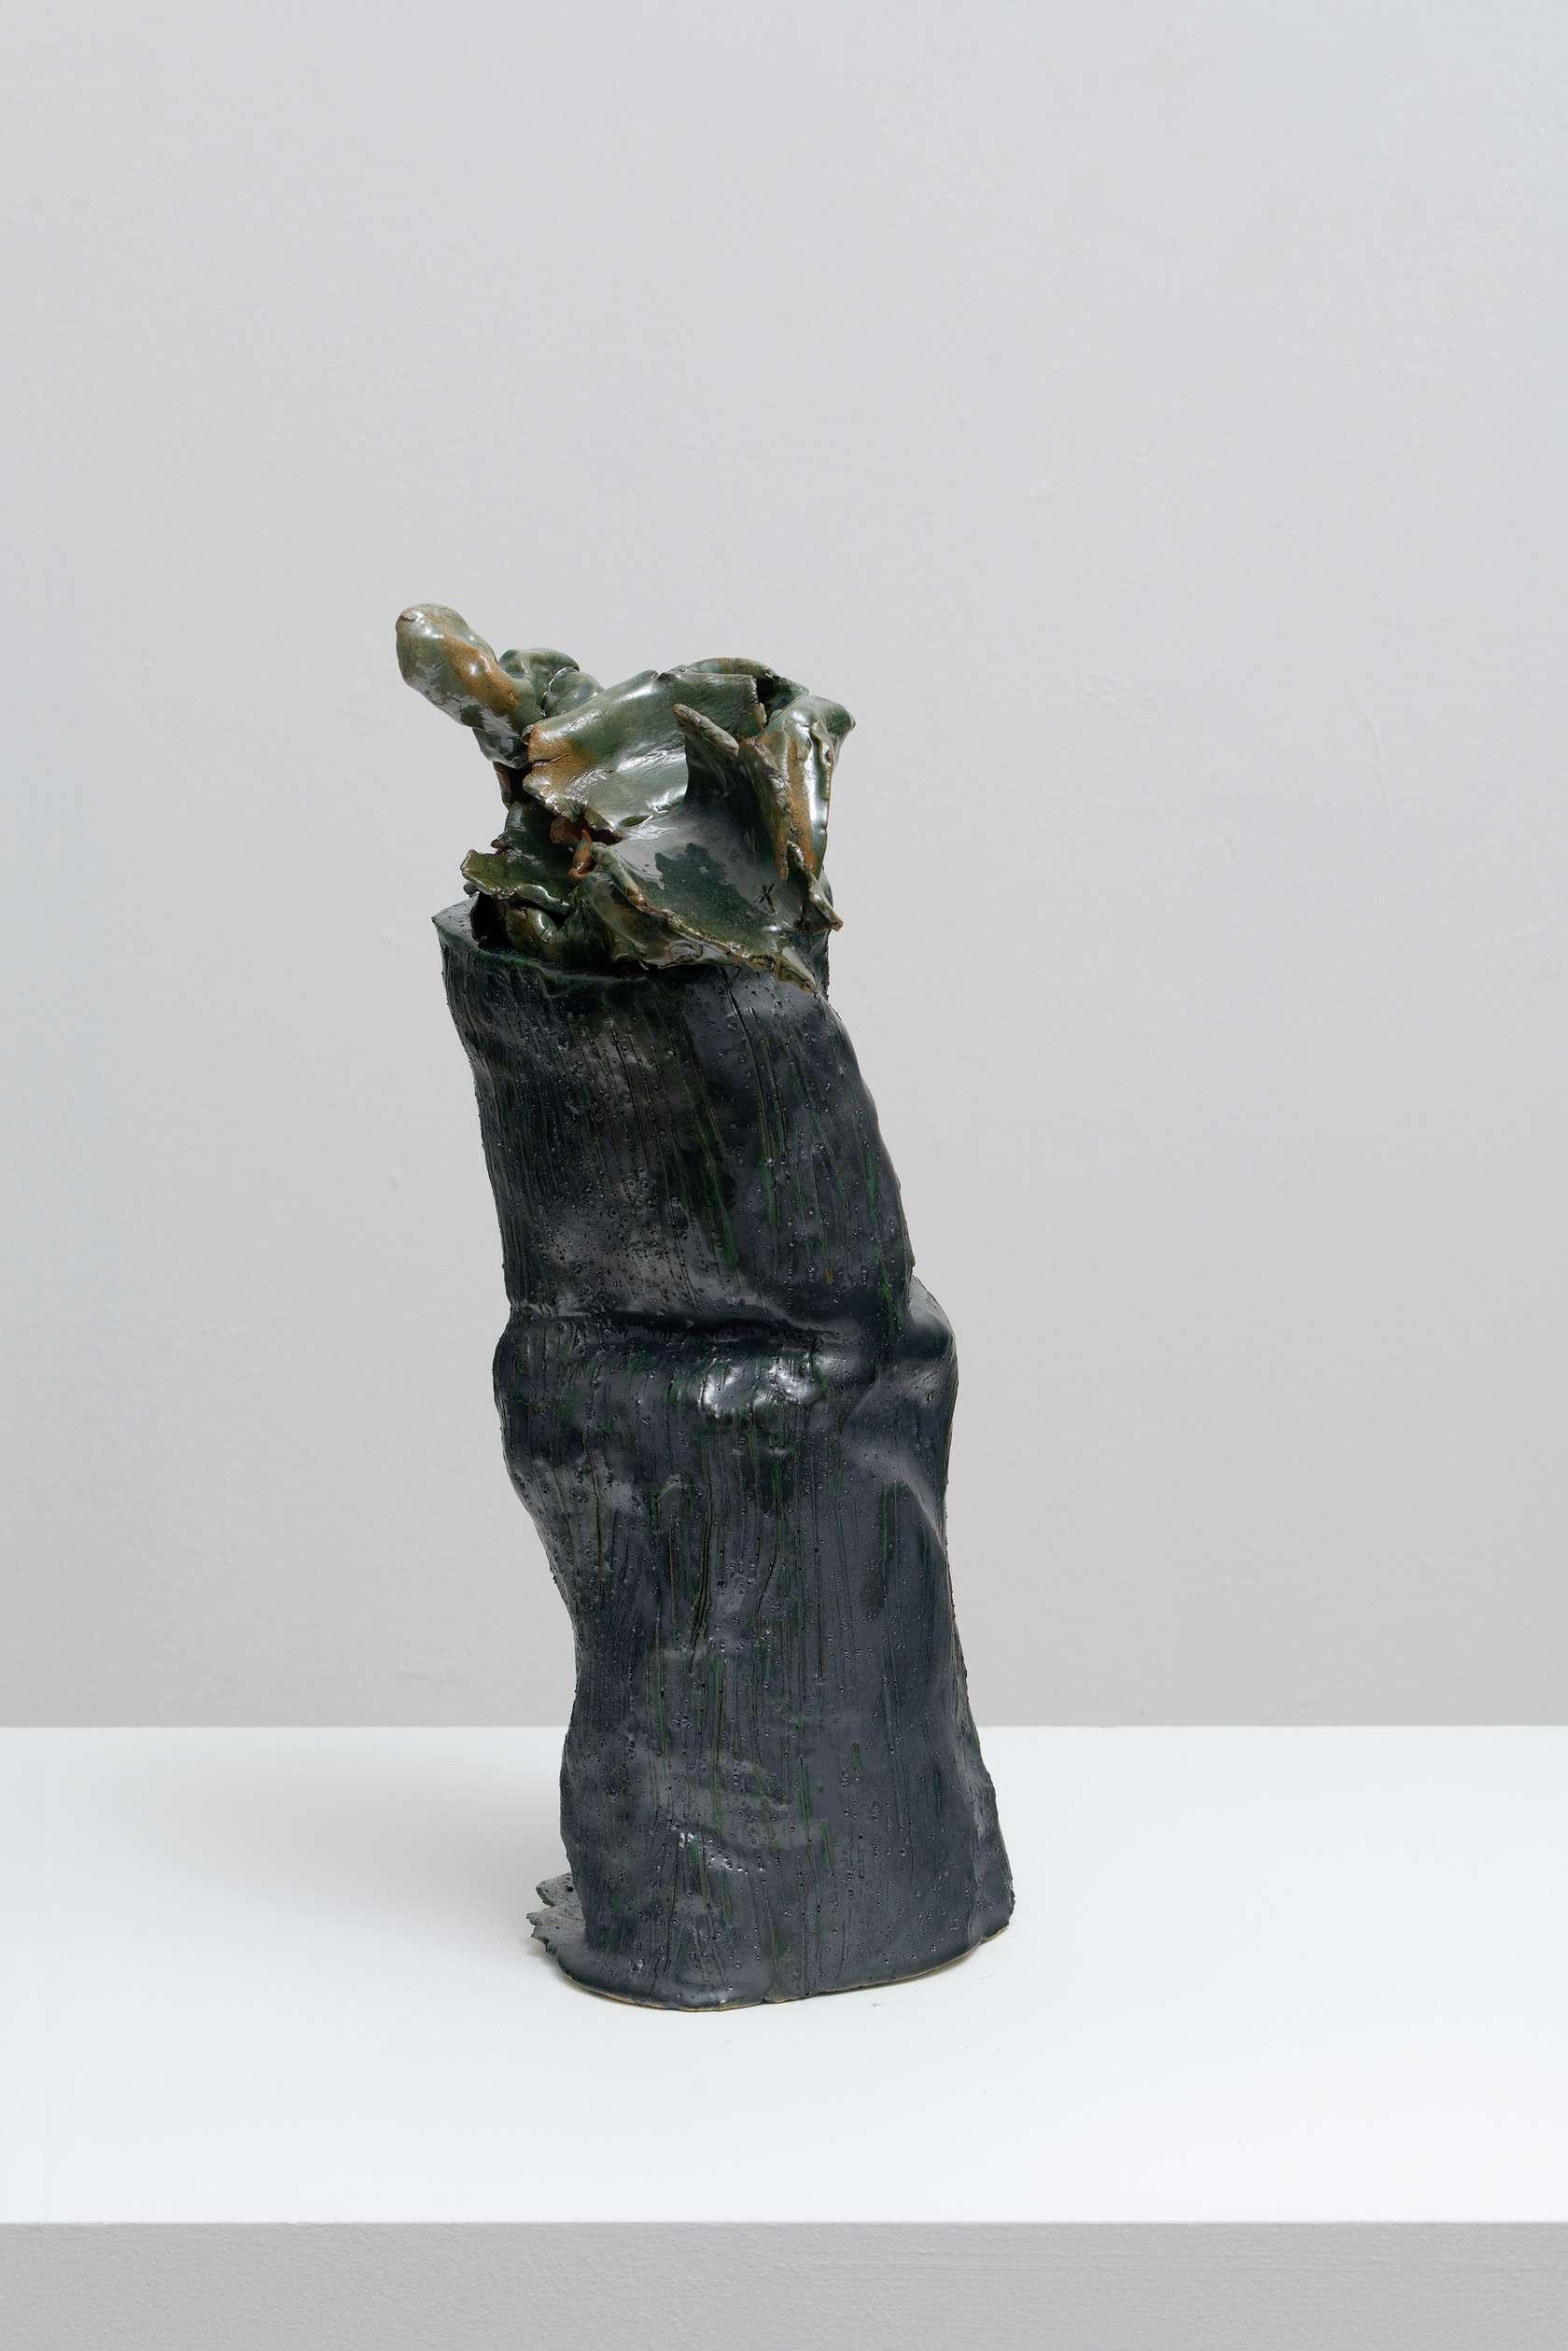 Salvatore Arancio, Untitled, 2019 Céramique émaillée45 x 20 x 19 cm / 17 6/8 x 7 7/8 x 7 1/2 inches